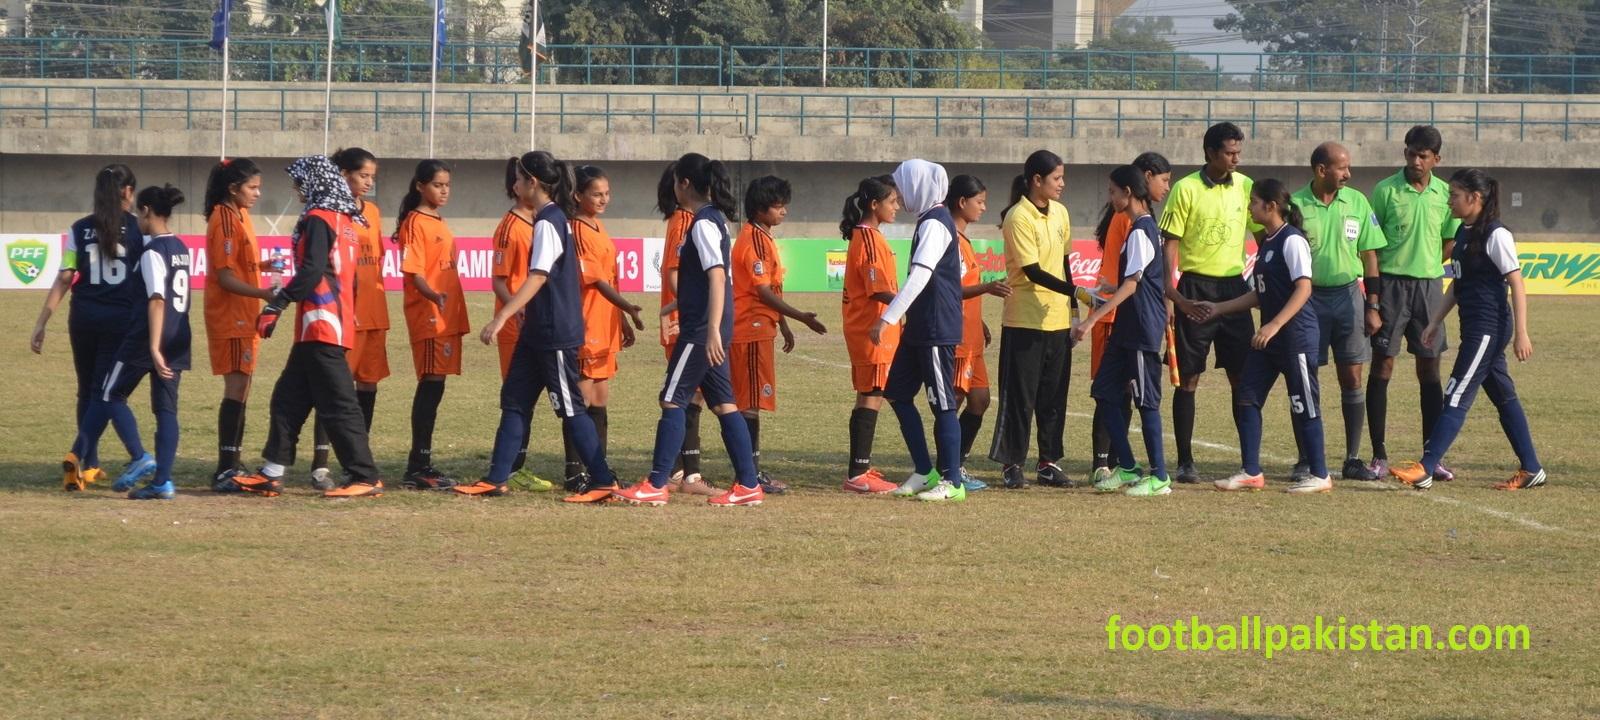 Women's football : Diya FC to field new talent from Manghopir [Express Tribune]